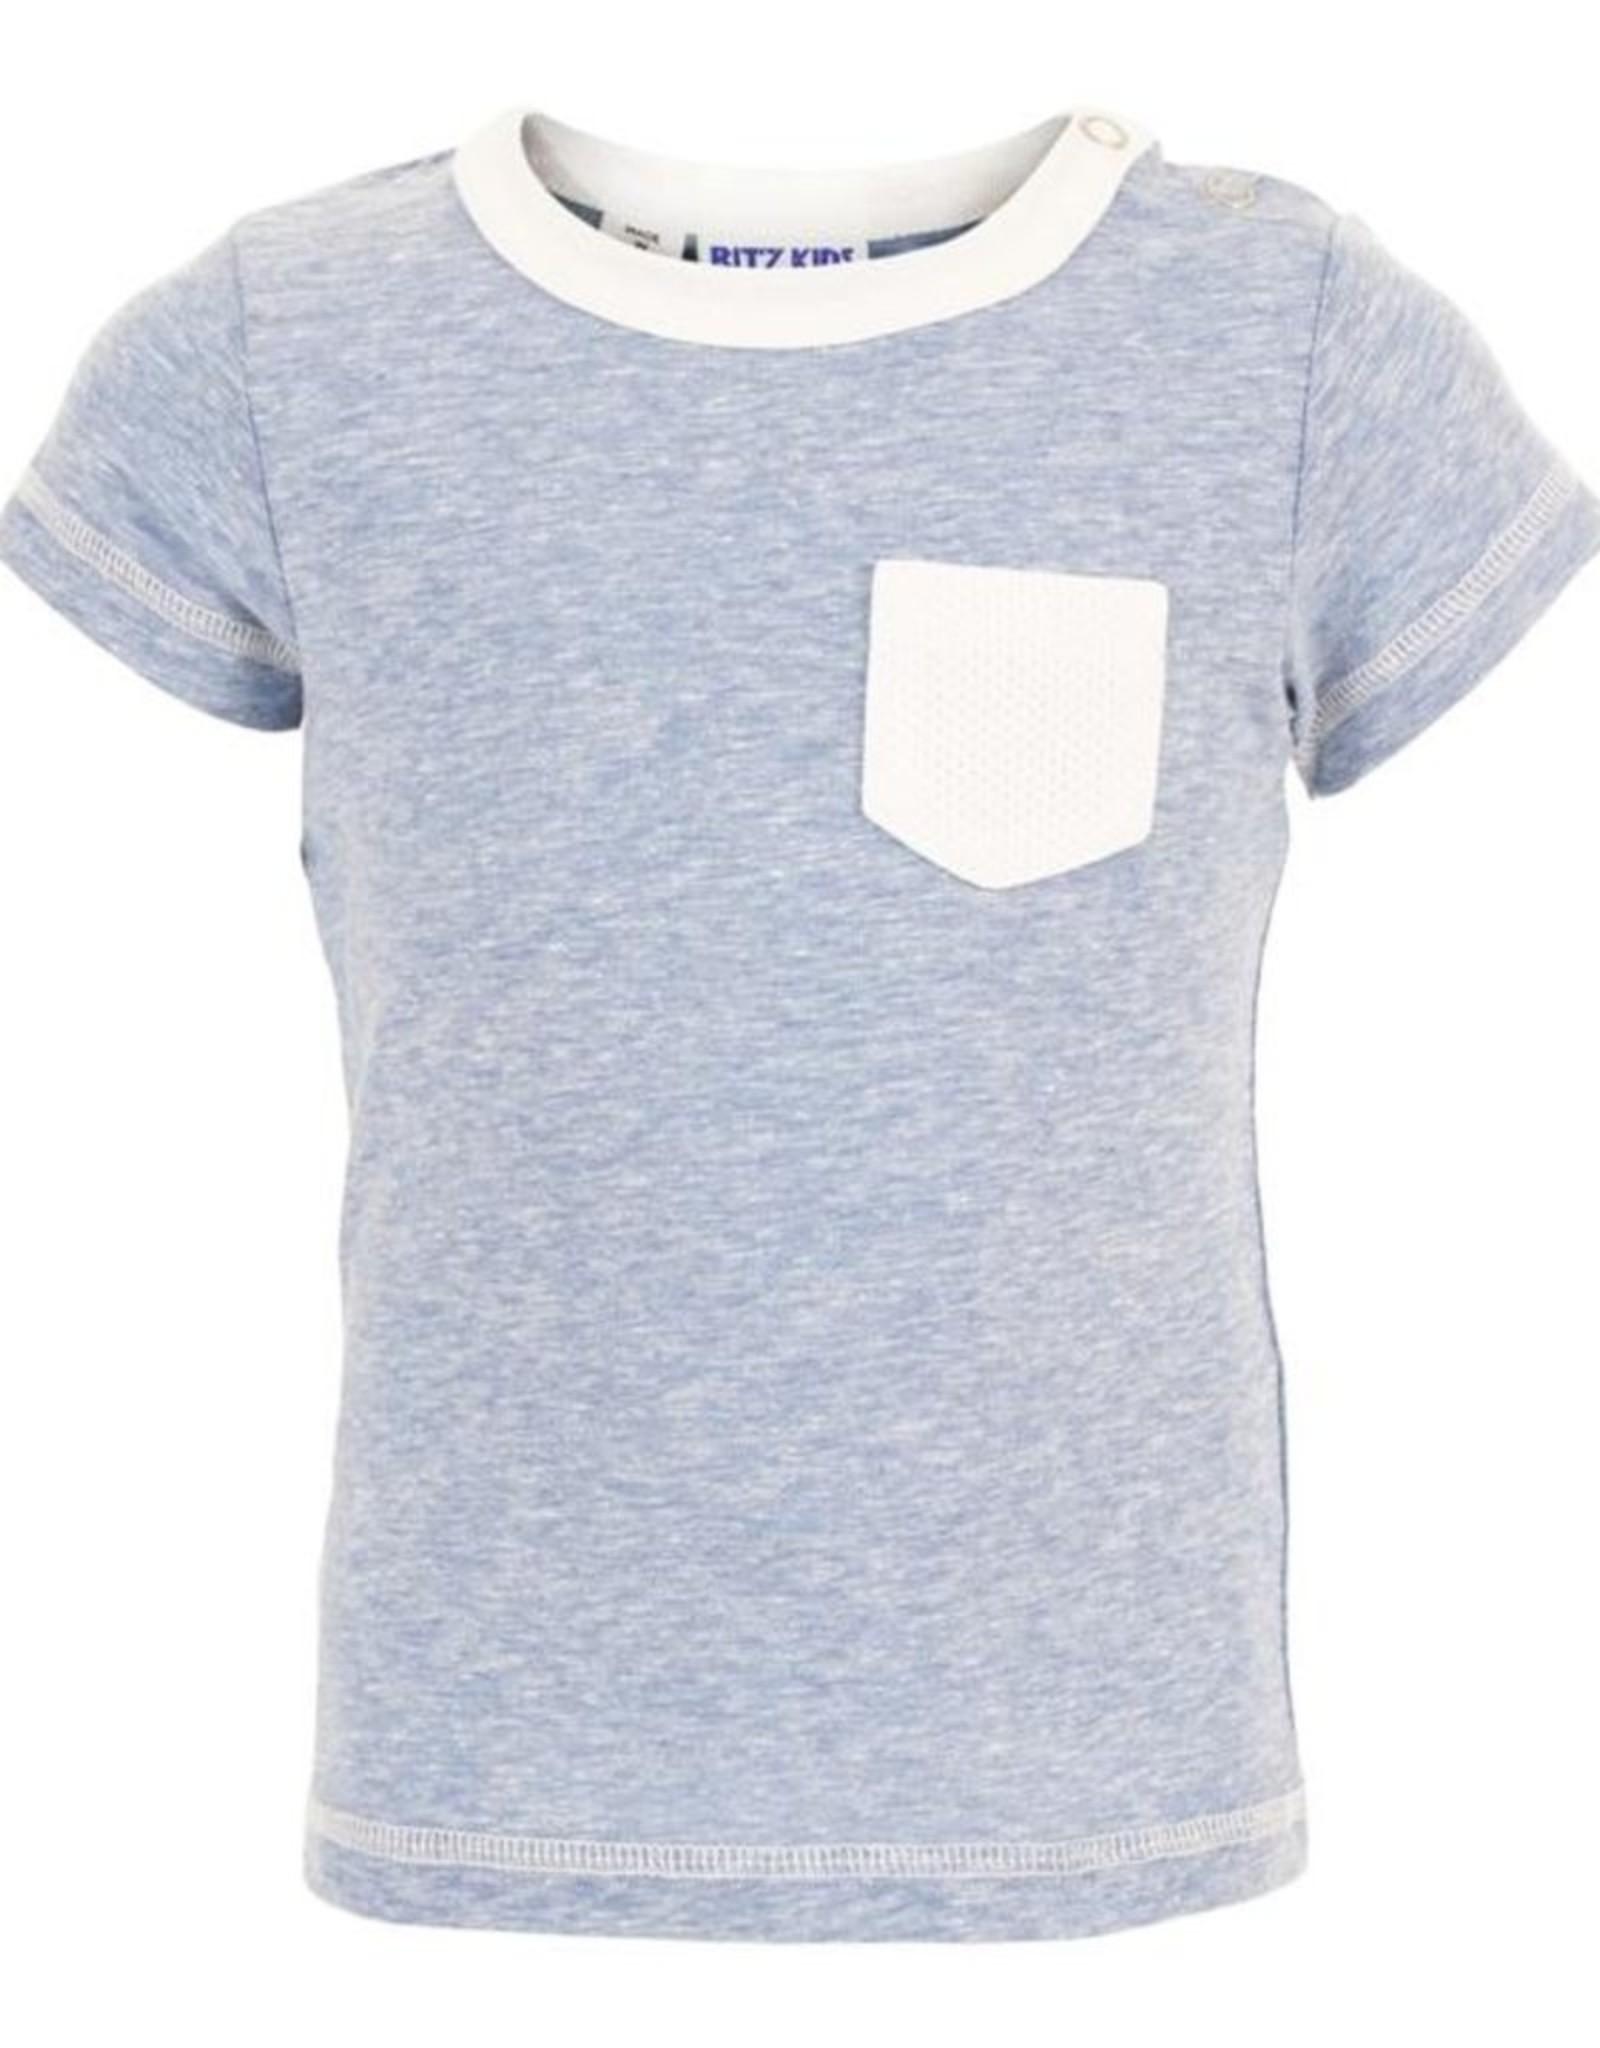 Bit'z Kids Pocket T Shirt - Blue or White